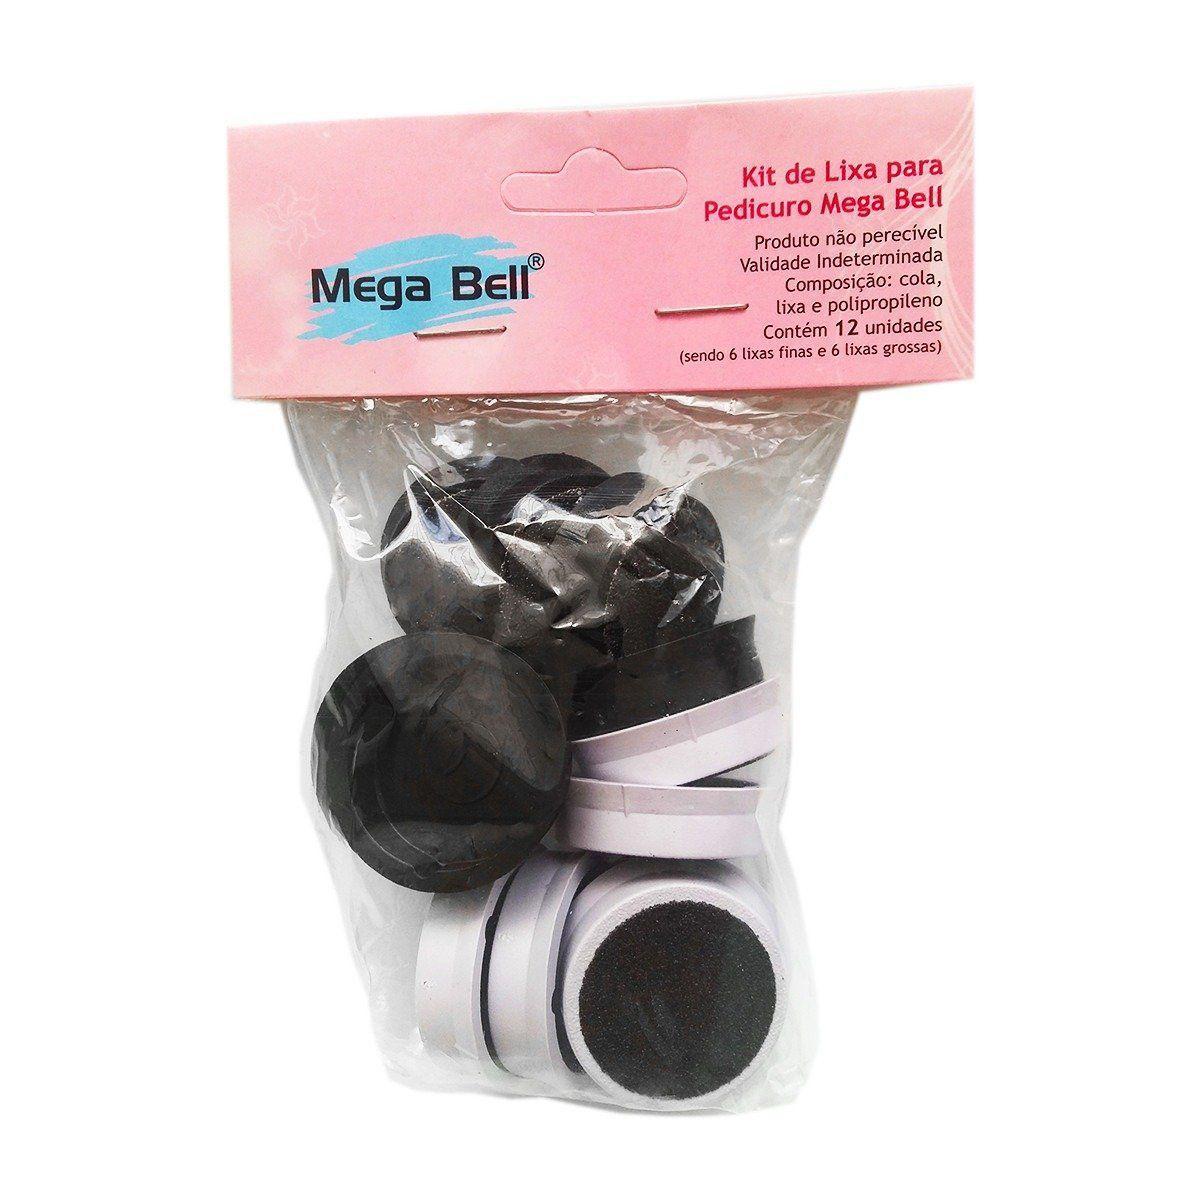 Pedicuro Elétrico Esfoliador Lixa Elétrica para os Pés Branco + 36 Lixas Descartáveis (Escolha a Voltagem)